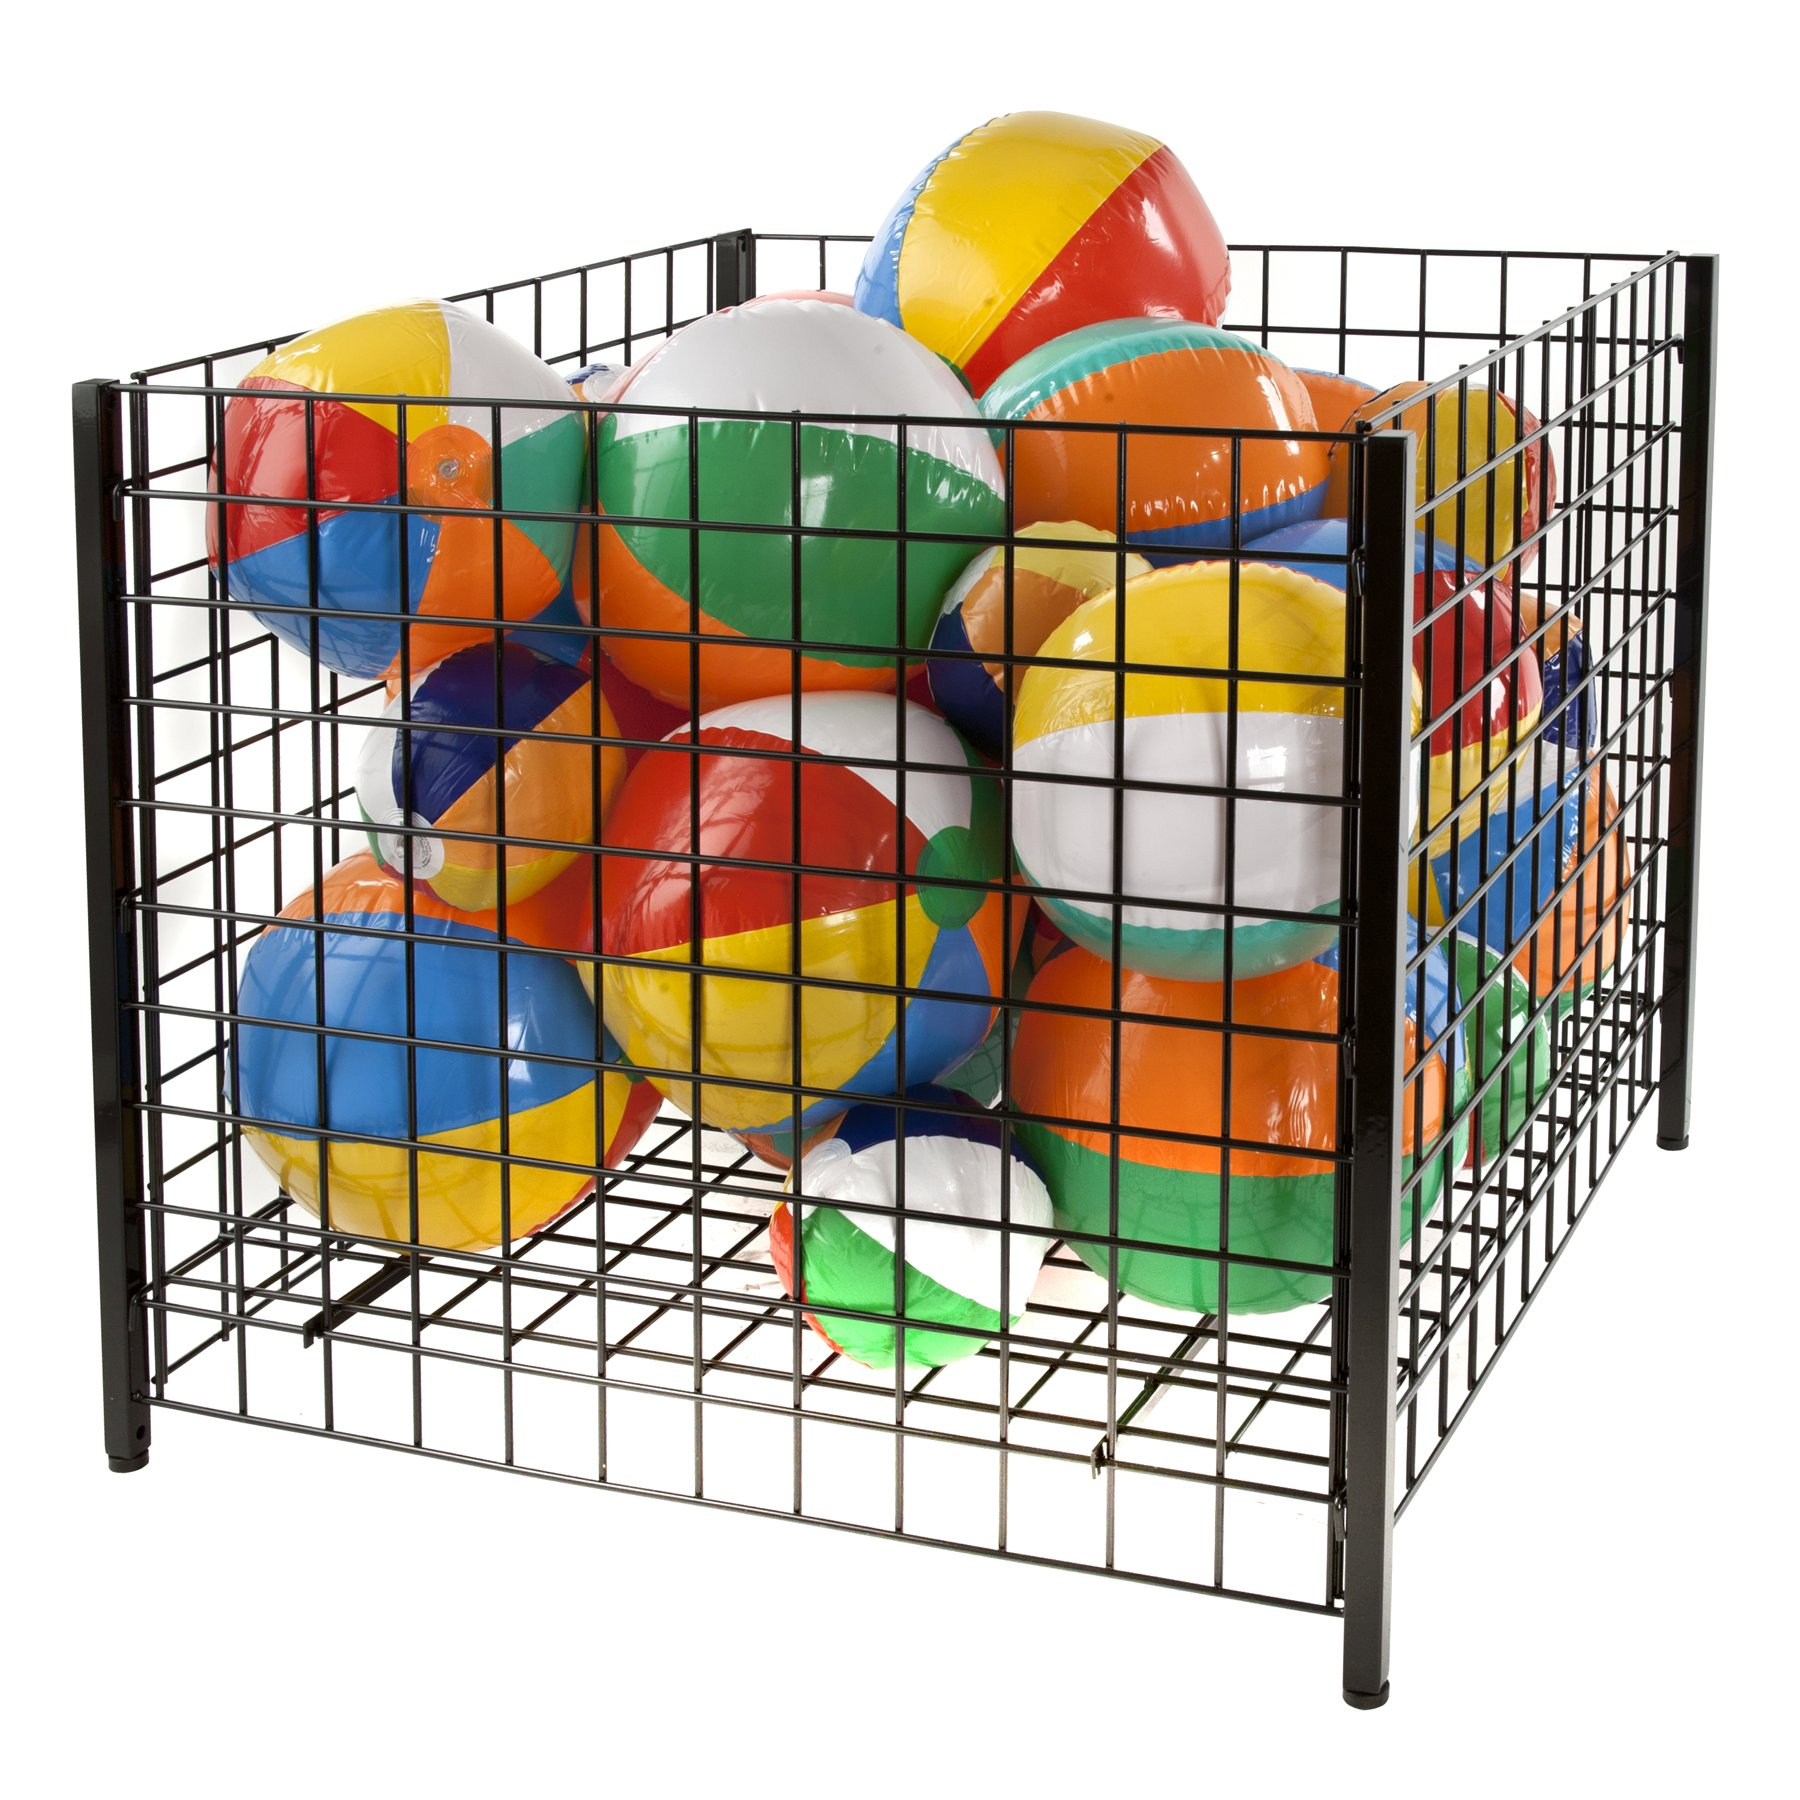 Econoco Grid Dump Bin with Levelers, Square, 36'', Black